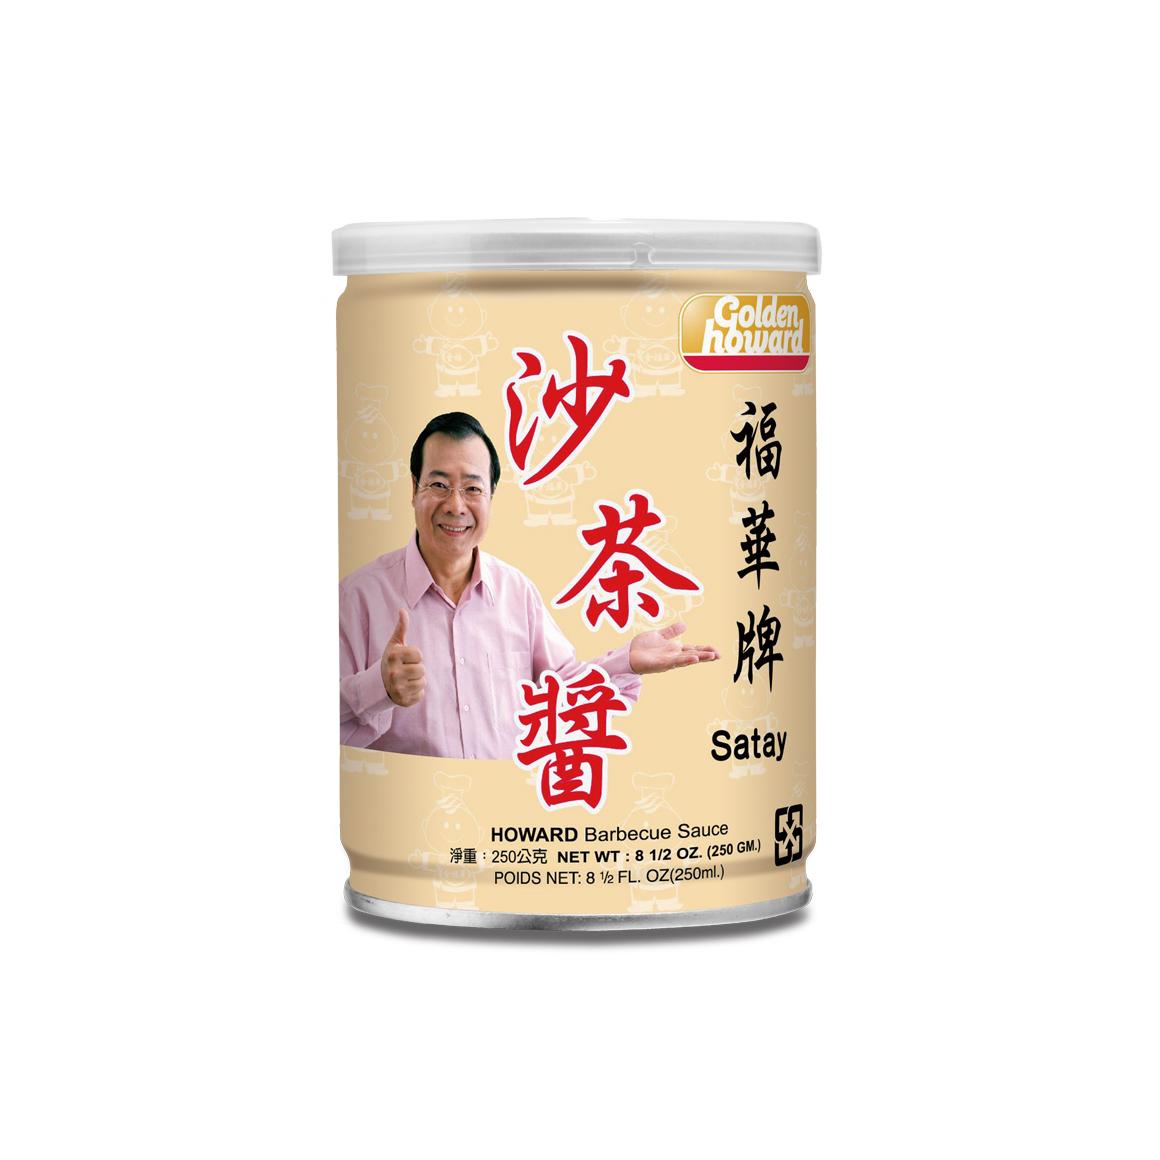 20200526-B107-福華牌沙茶醬250g-罐裝易開+廖俊-官網1160x1160